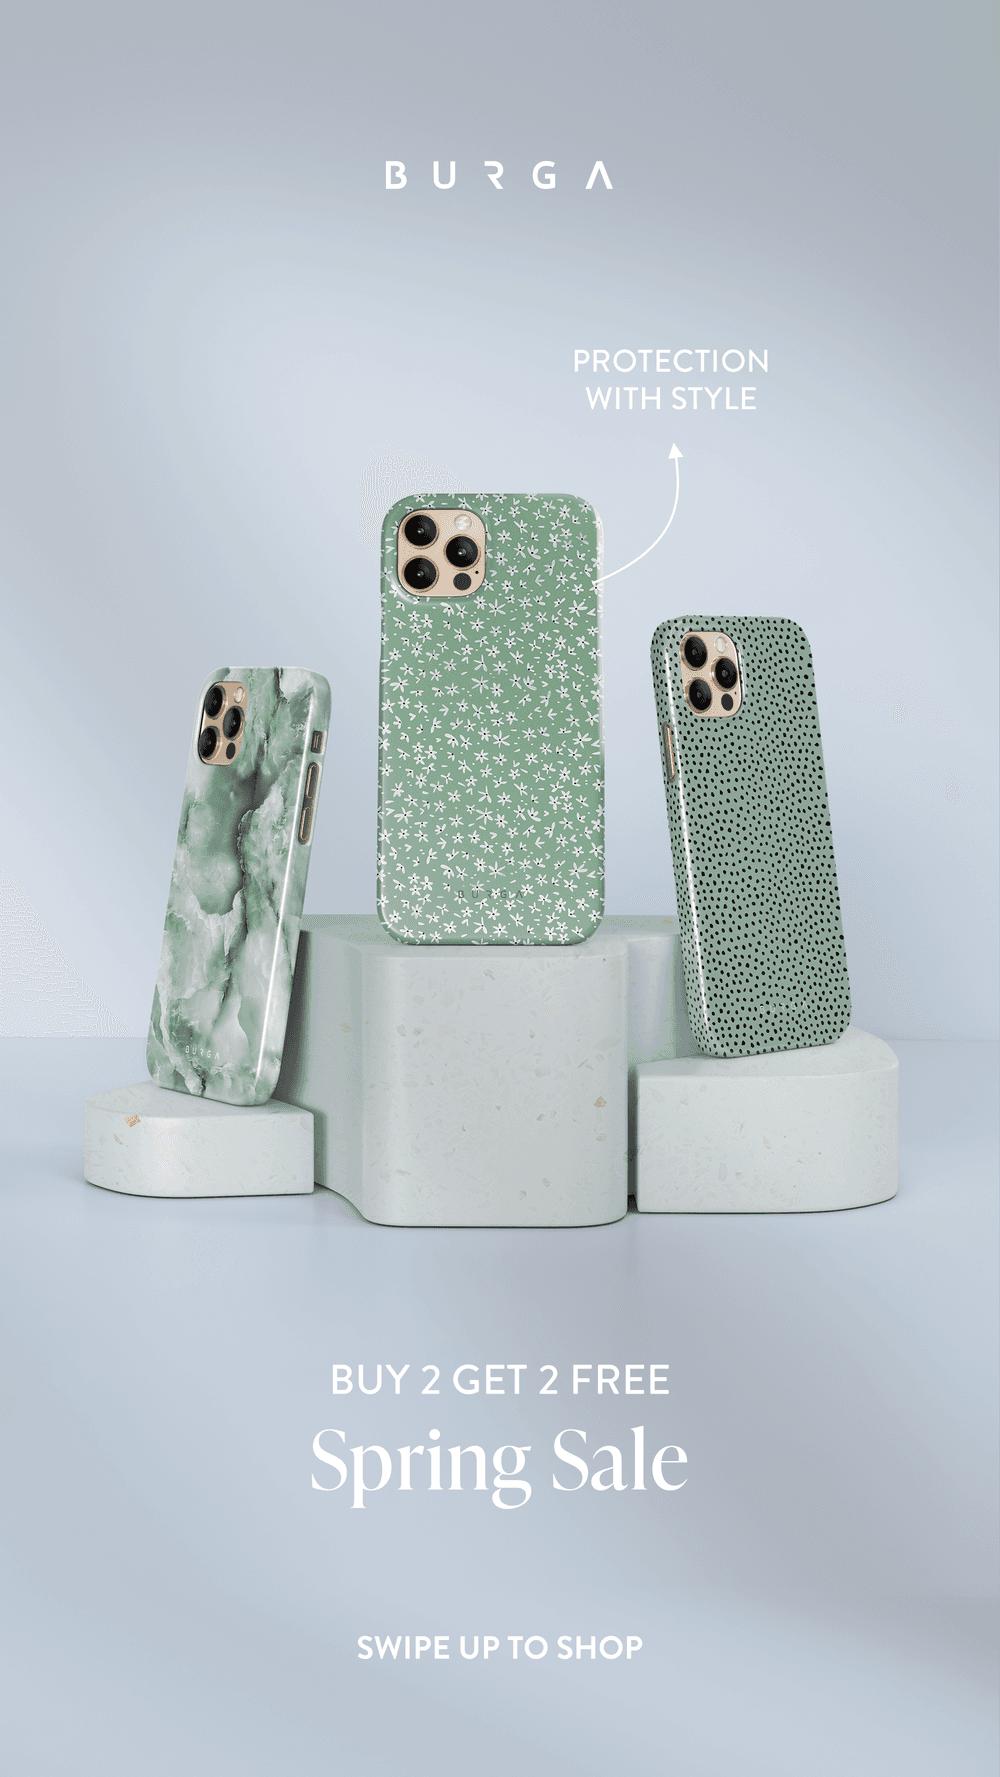 Facebook single image ads accessories brand